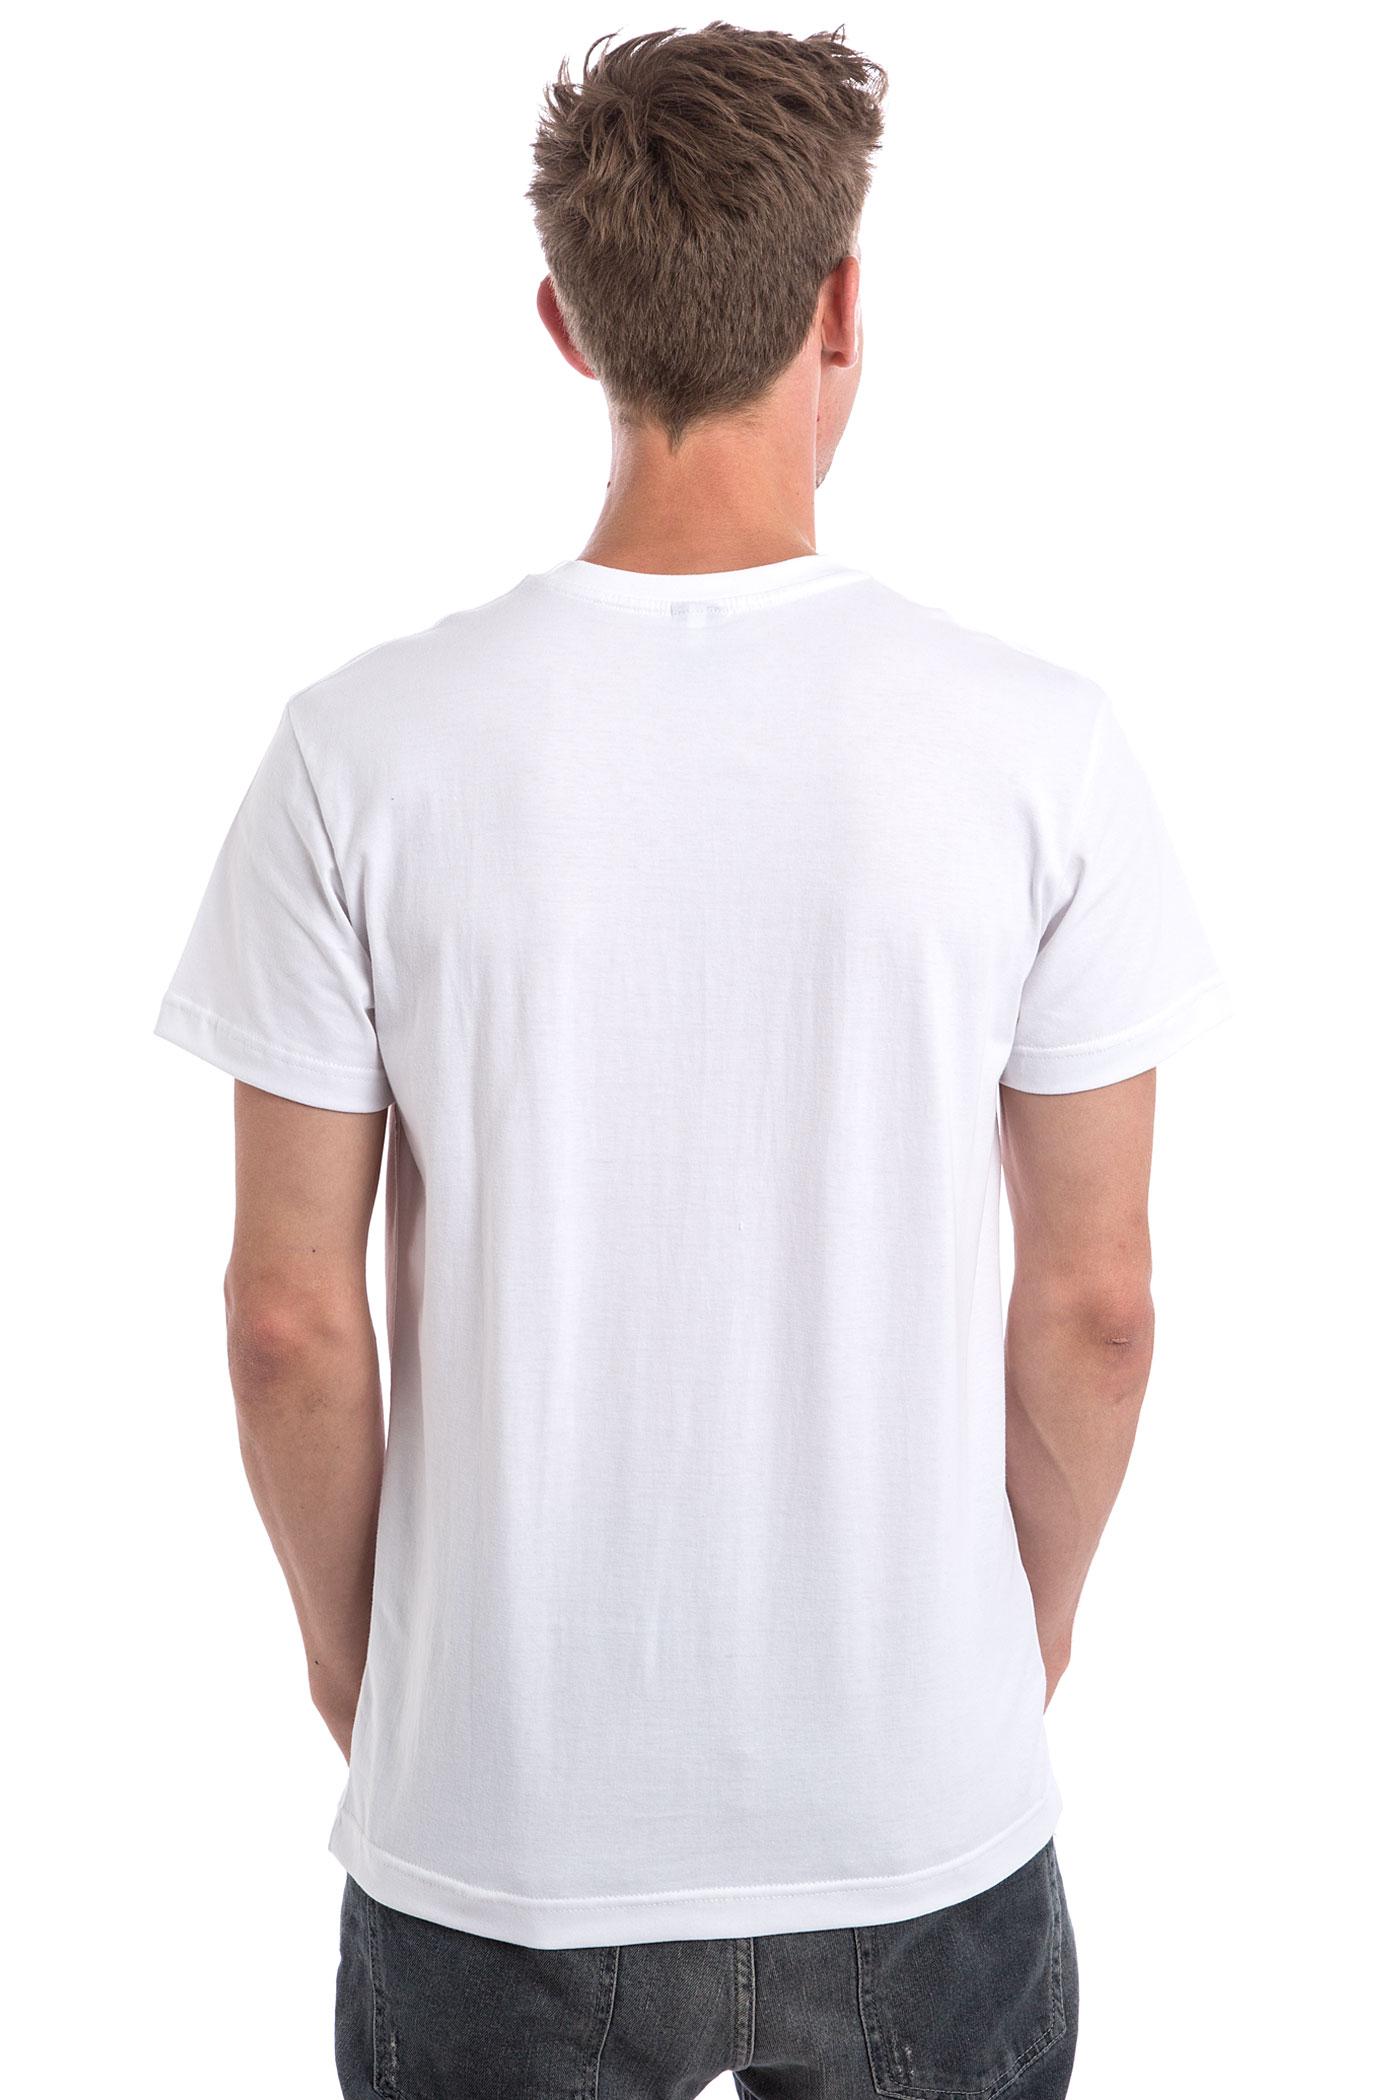 iriedaily pissizei t shirt white achetez sur skatedeluxe. Black Bedroom Furniture Sets. Home Design Ideas